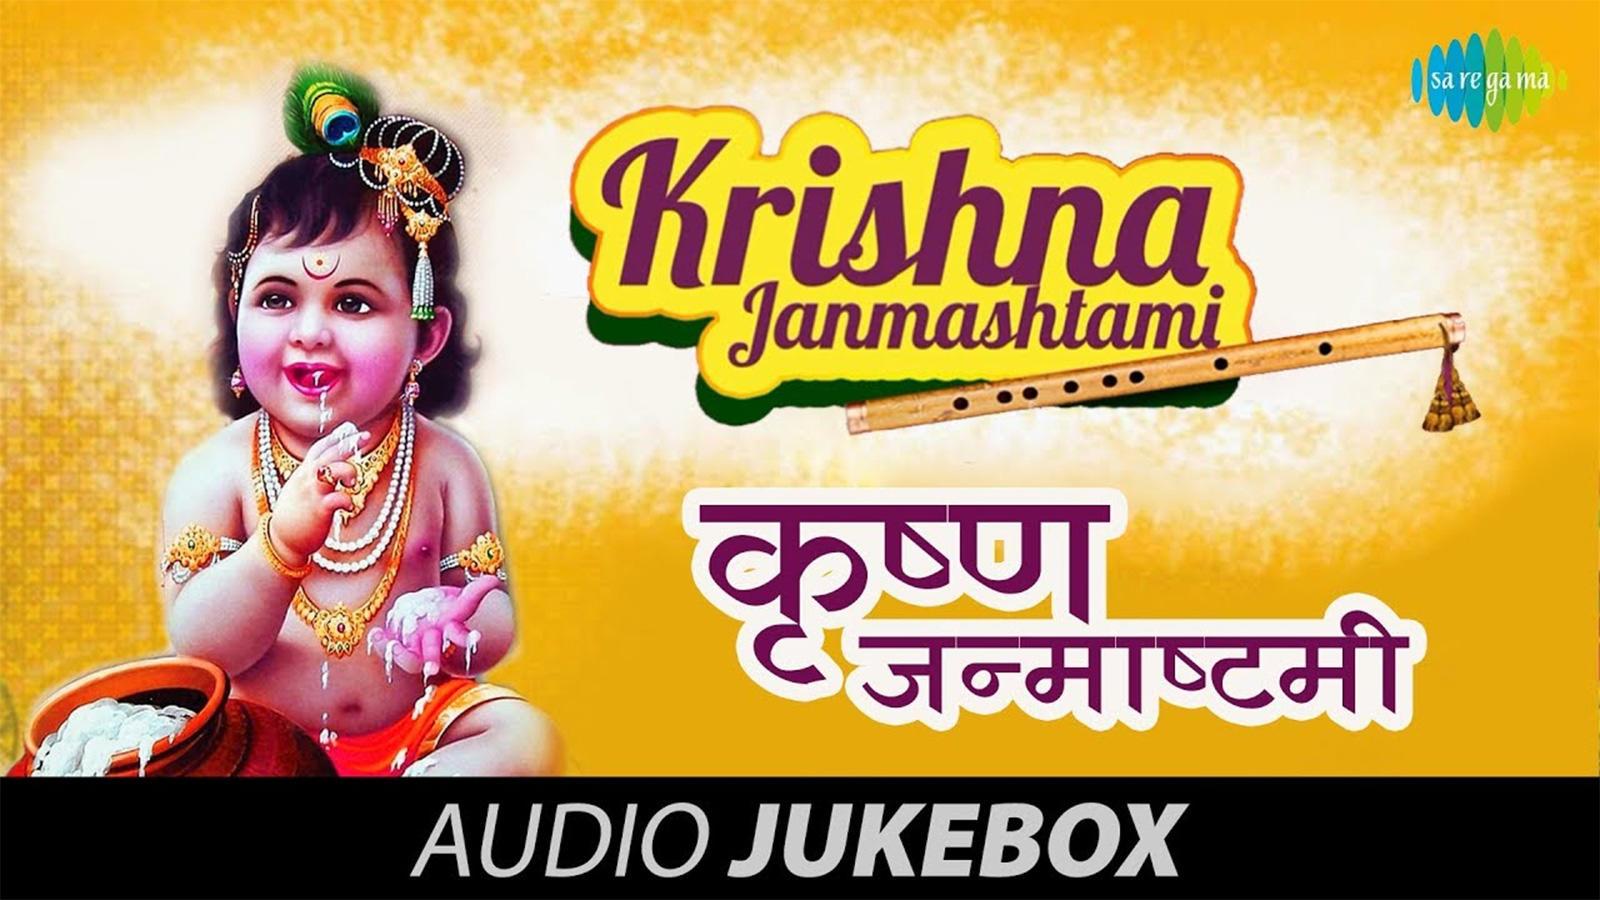 Shri Krishna Janmashtami 2019 Marathi - HD Wallpaper